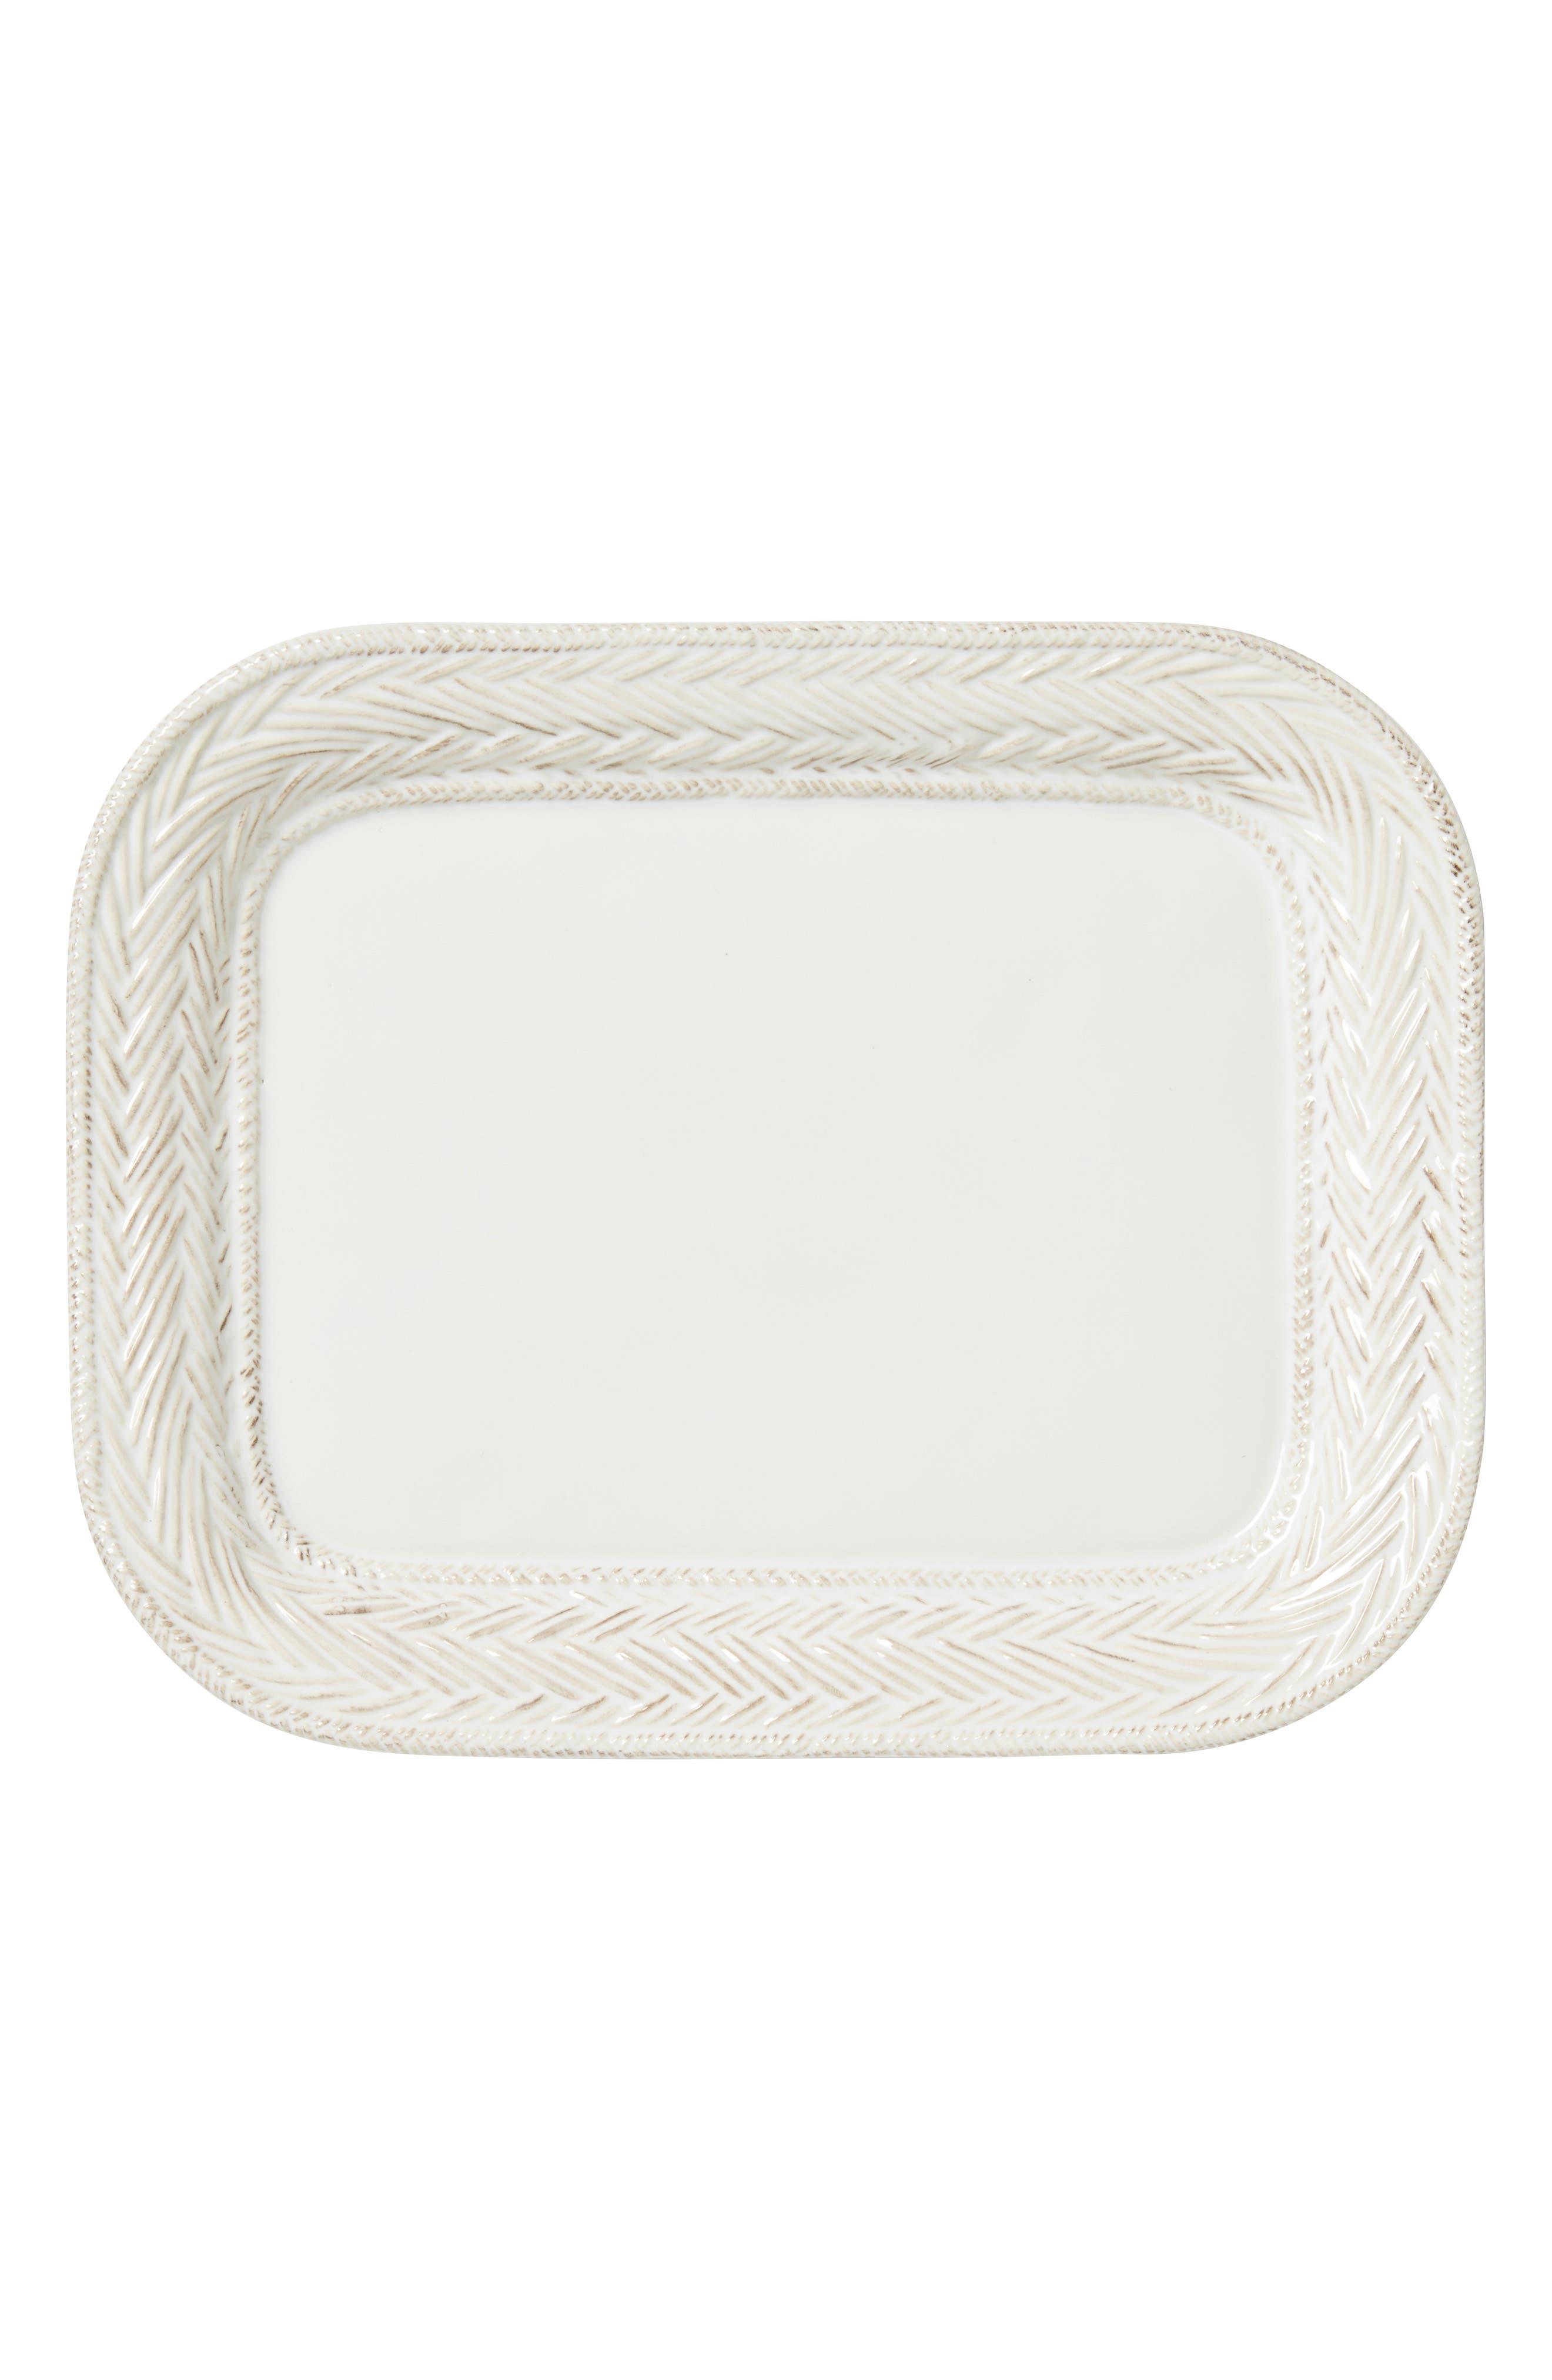 Le Panier Medium Serving Platter,                             Main thumbnail 1, color,                             WHITE